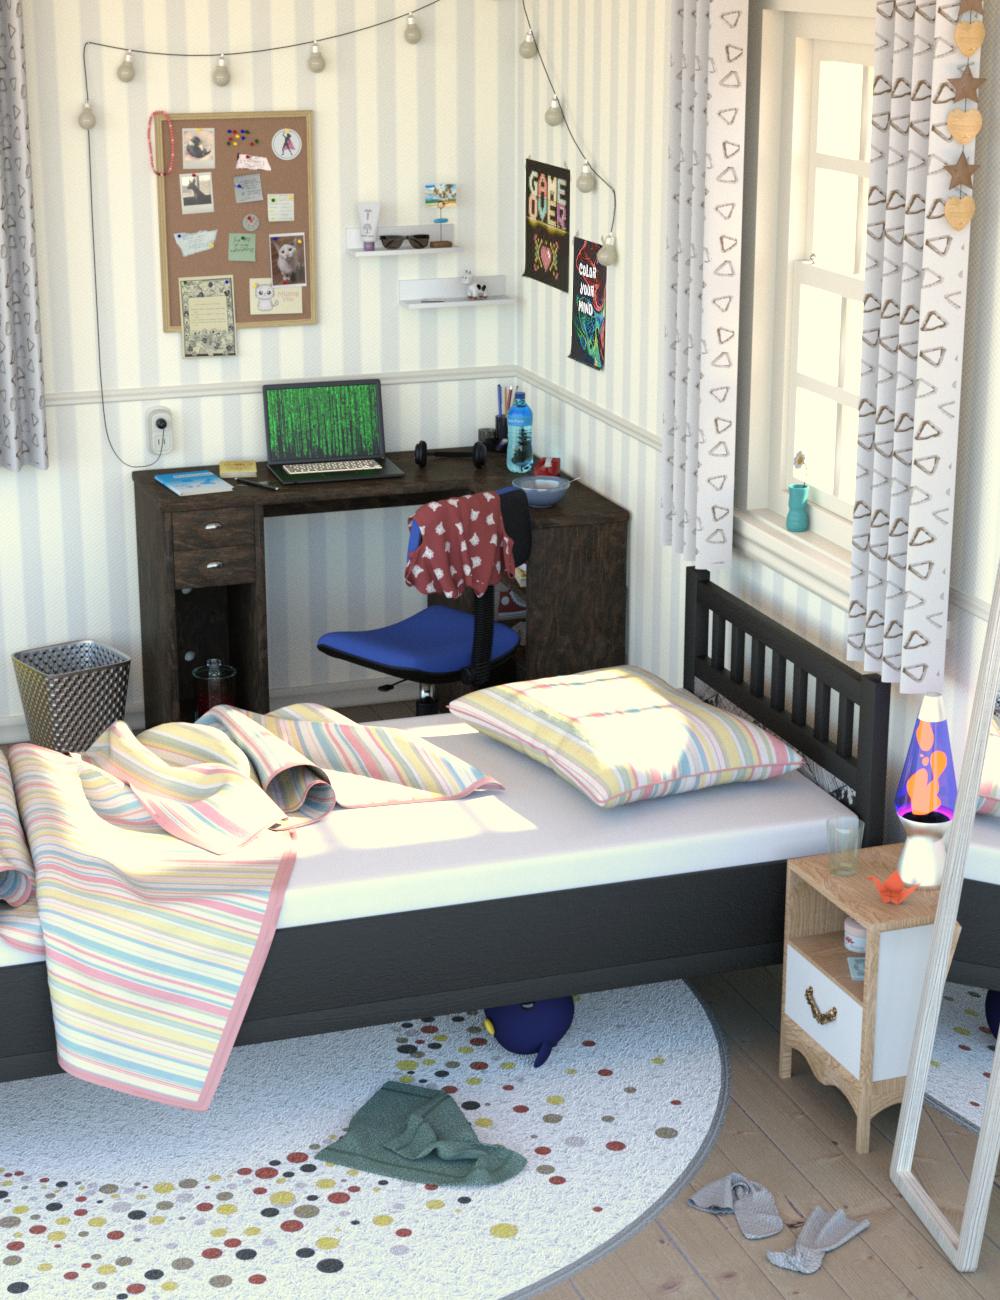 Messy Vignette Bedroom by: Sylvan, 3D Models by Daz 3D